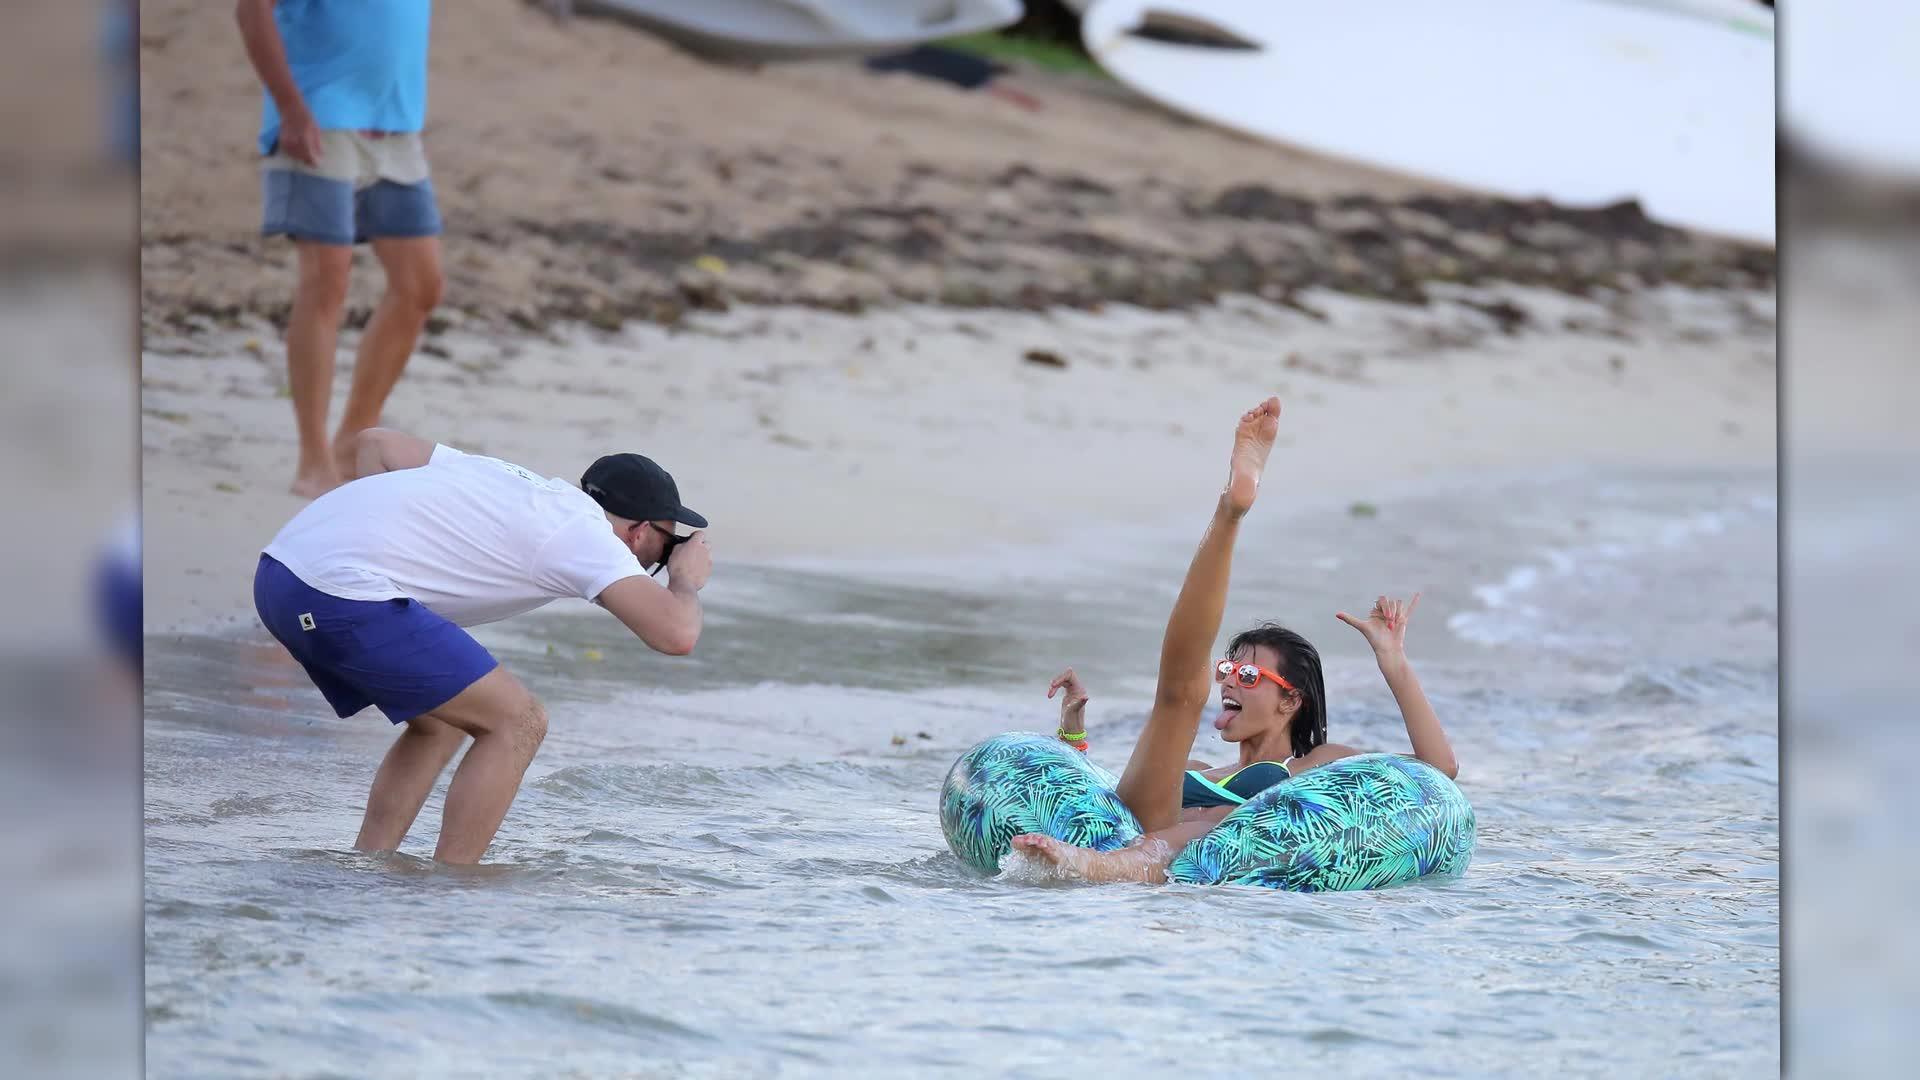 Georgia Fowler Stuns in Victoria's Secret Bikini Shoot